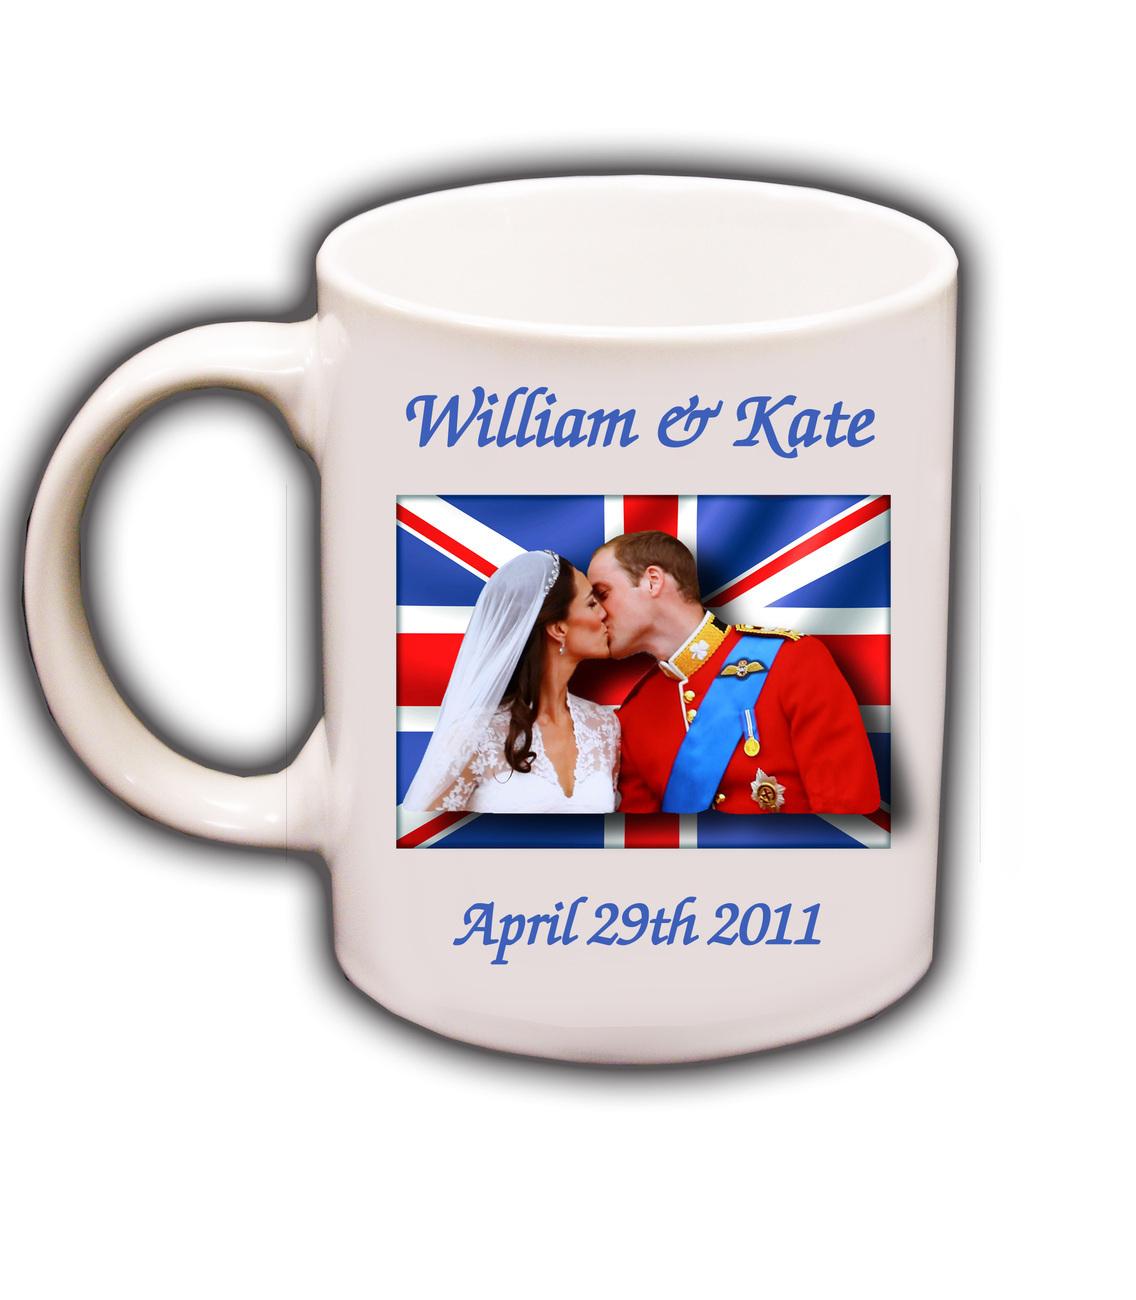 Wedding Gift Ideas Over USD500 : ... William & Kate Middleton Royal Wedding Coffee Mug #2Glassware